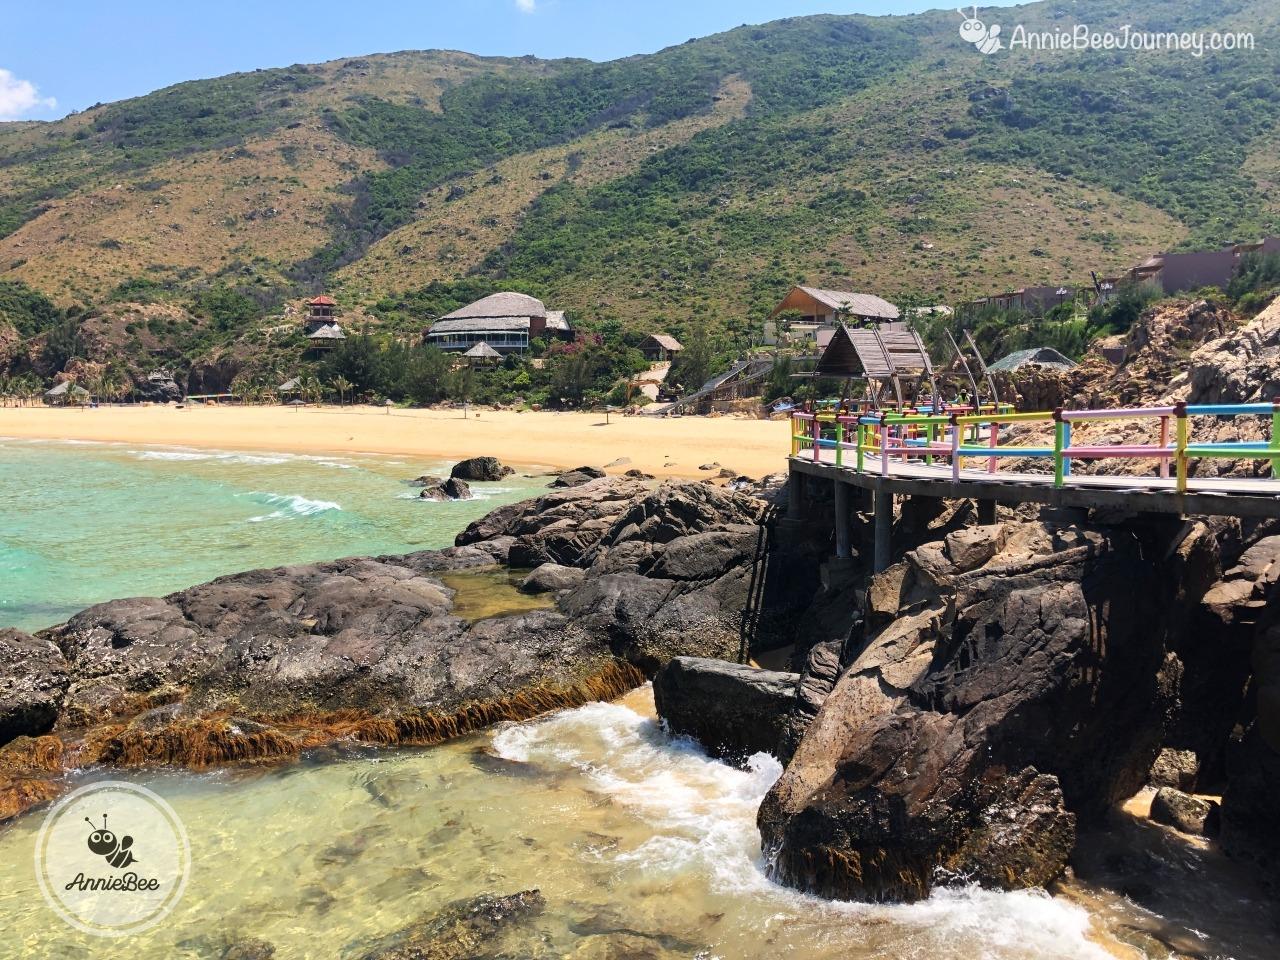 Ky Co island in Quy Nhon, Vietnam